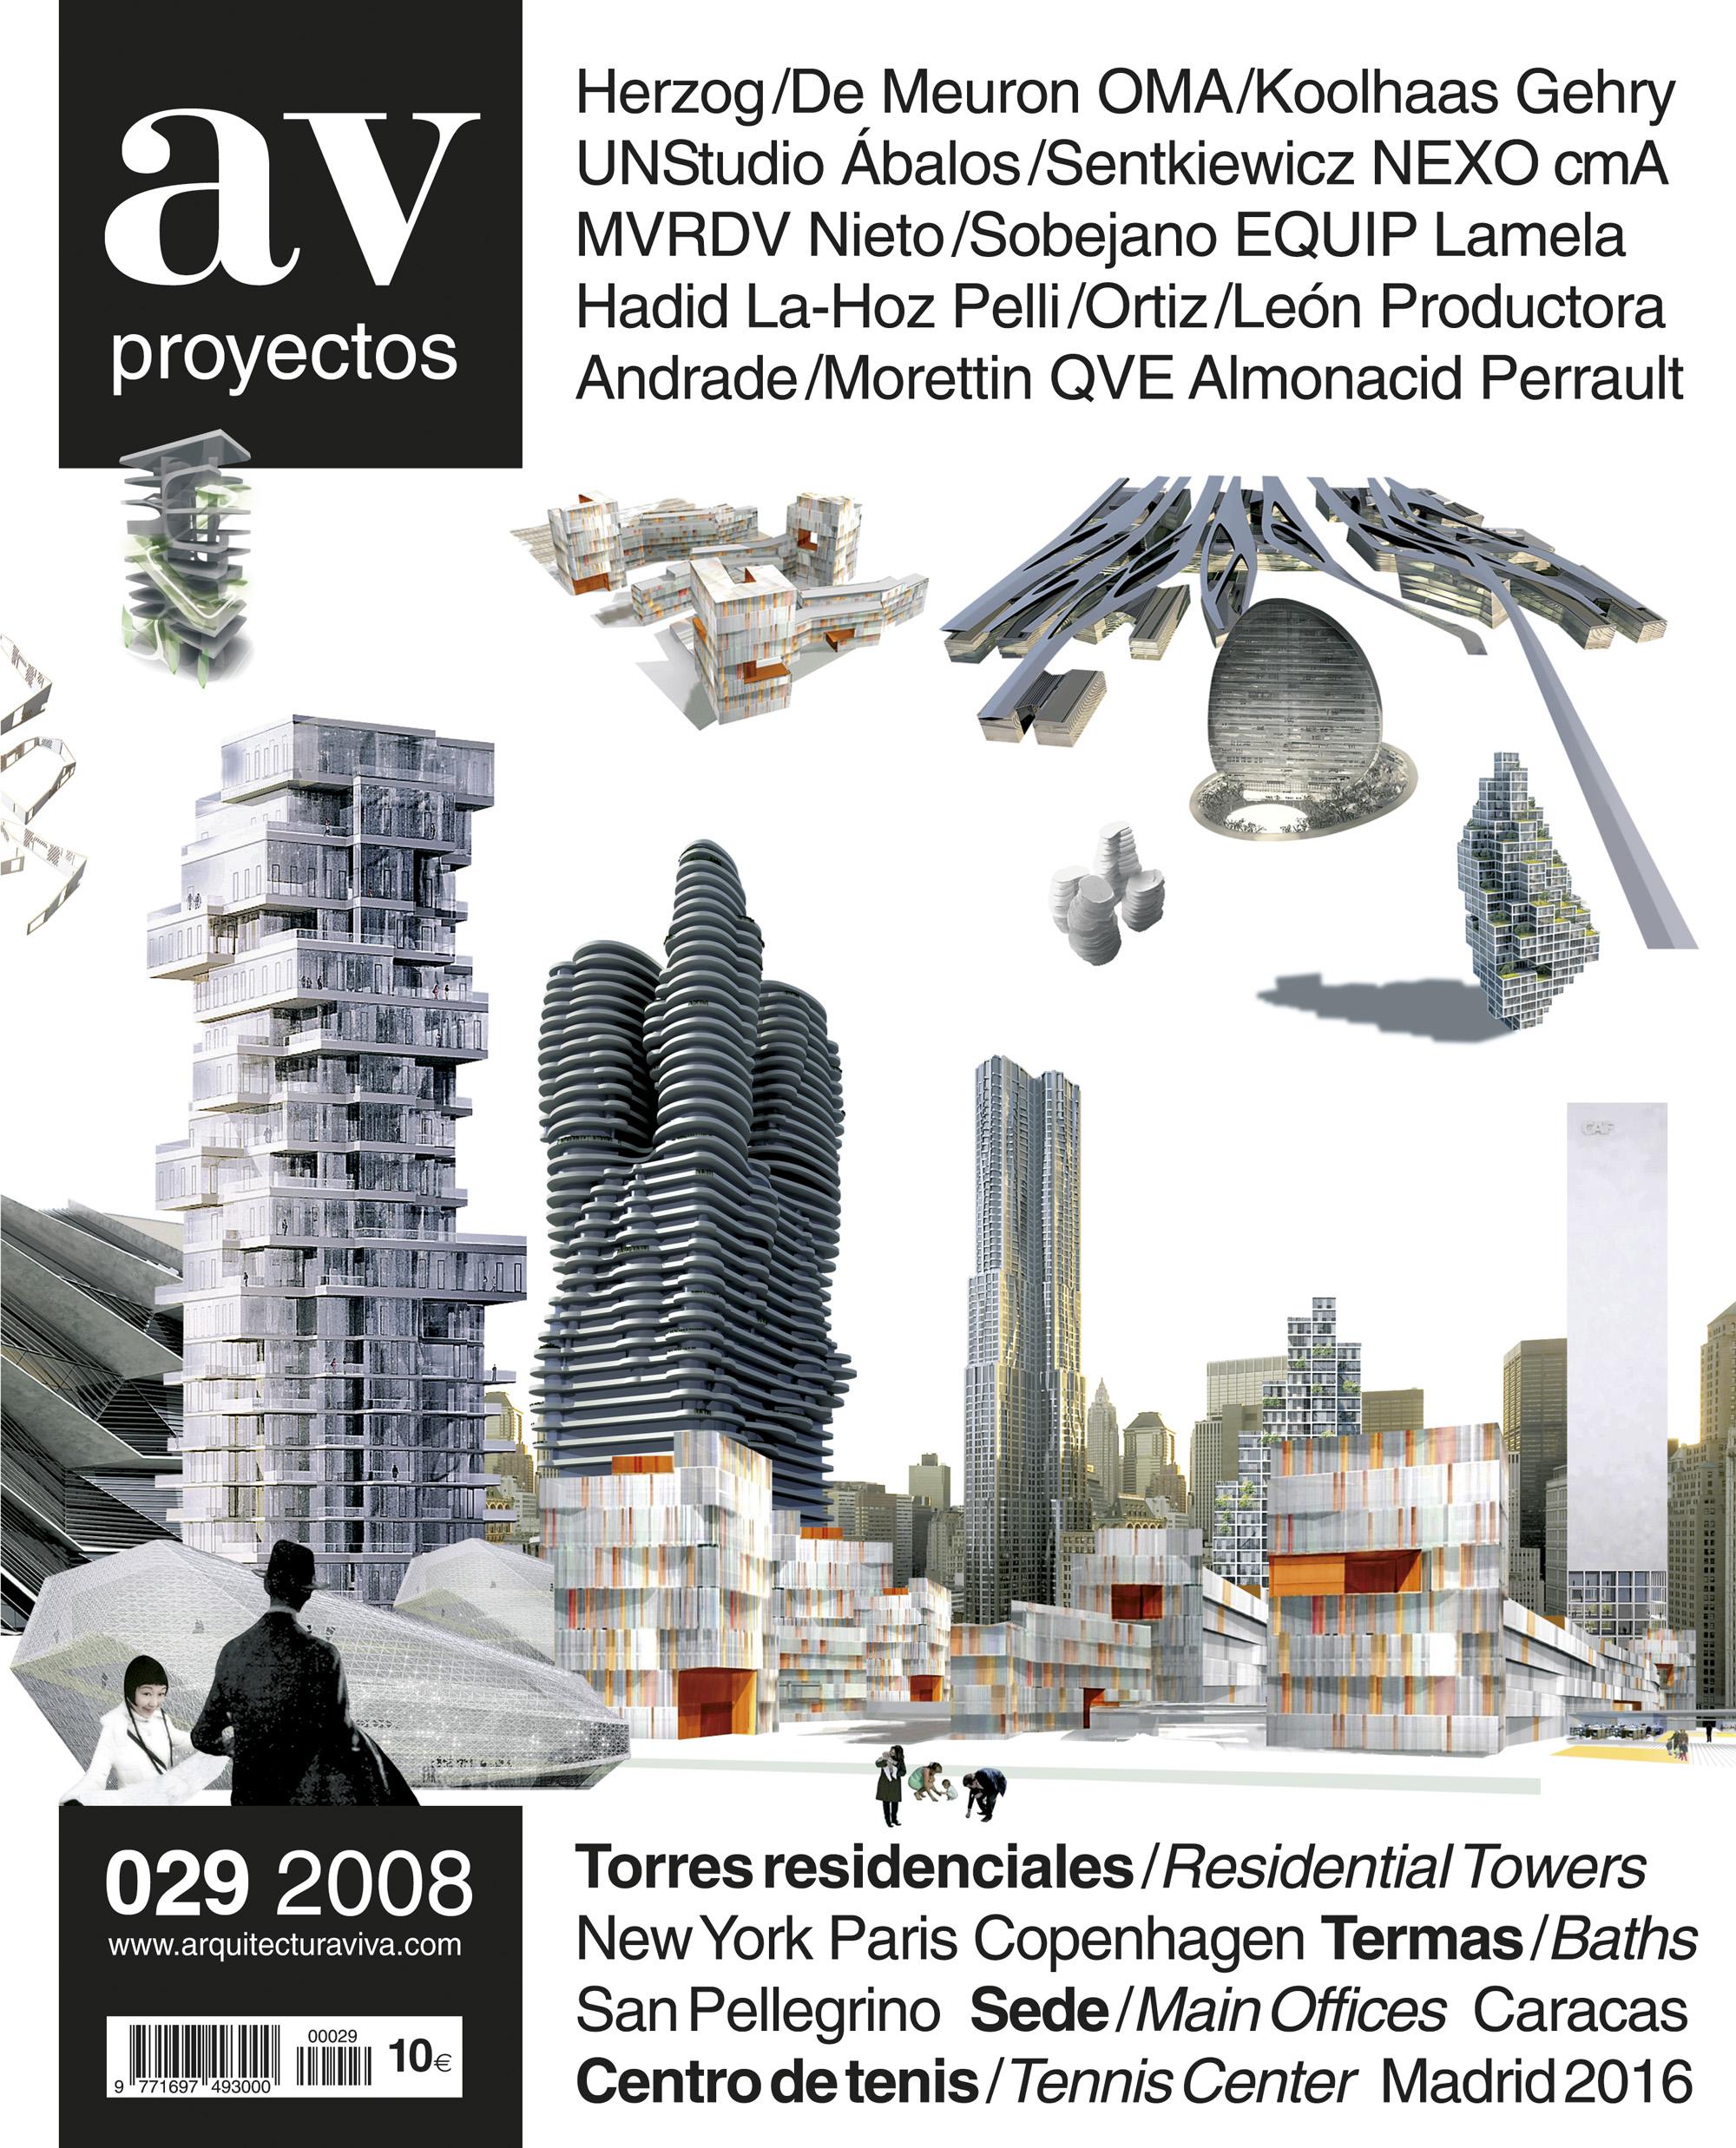 Torres residenciales